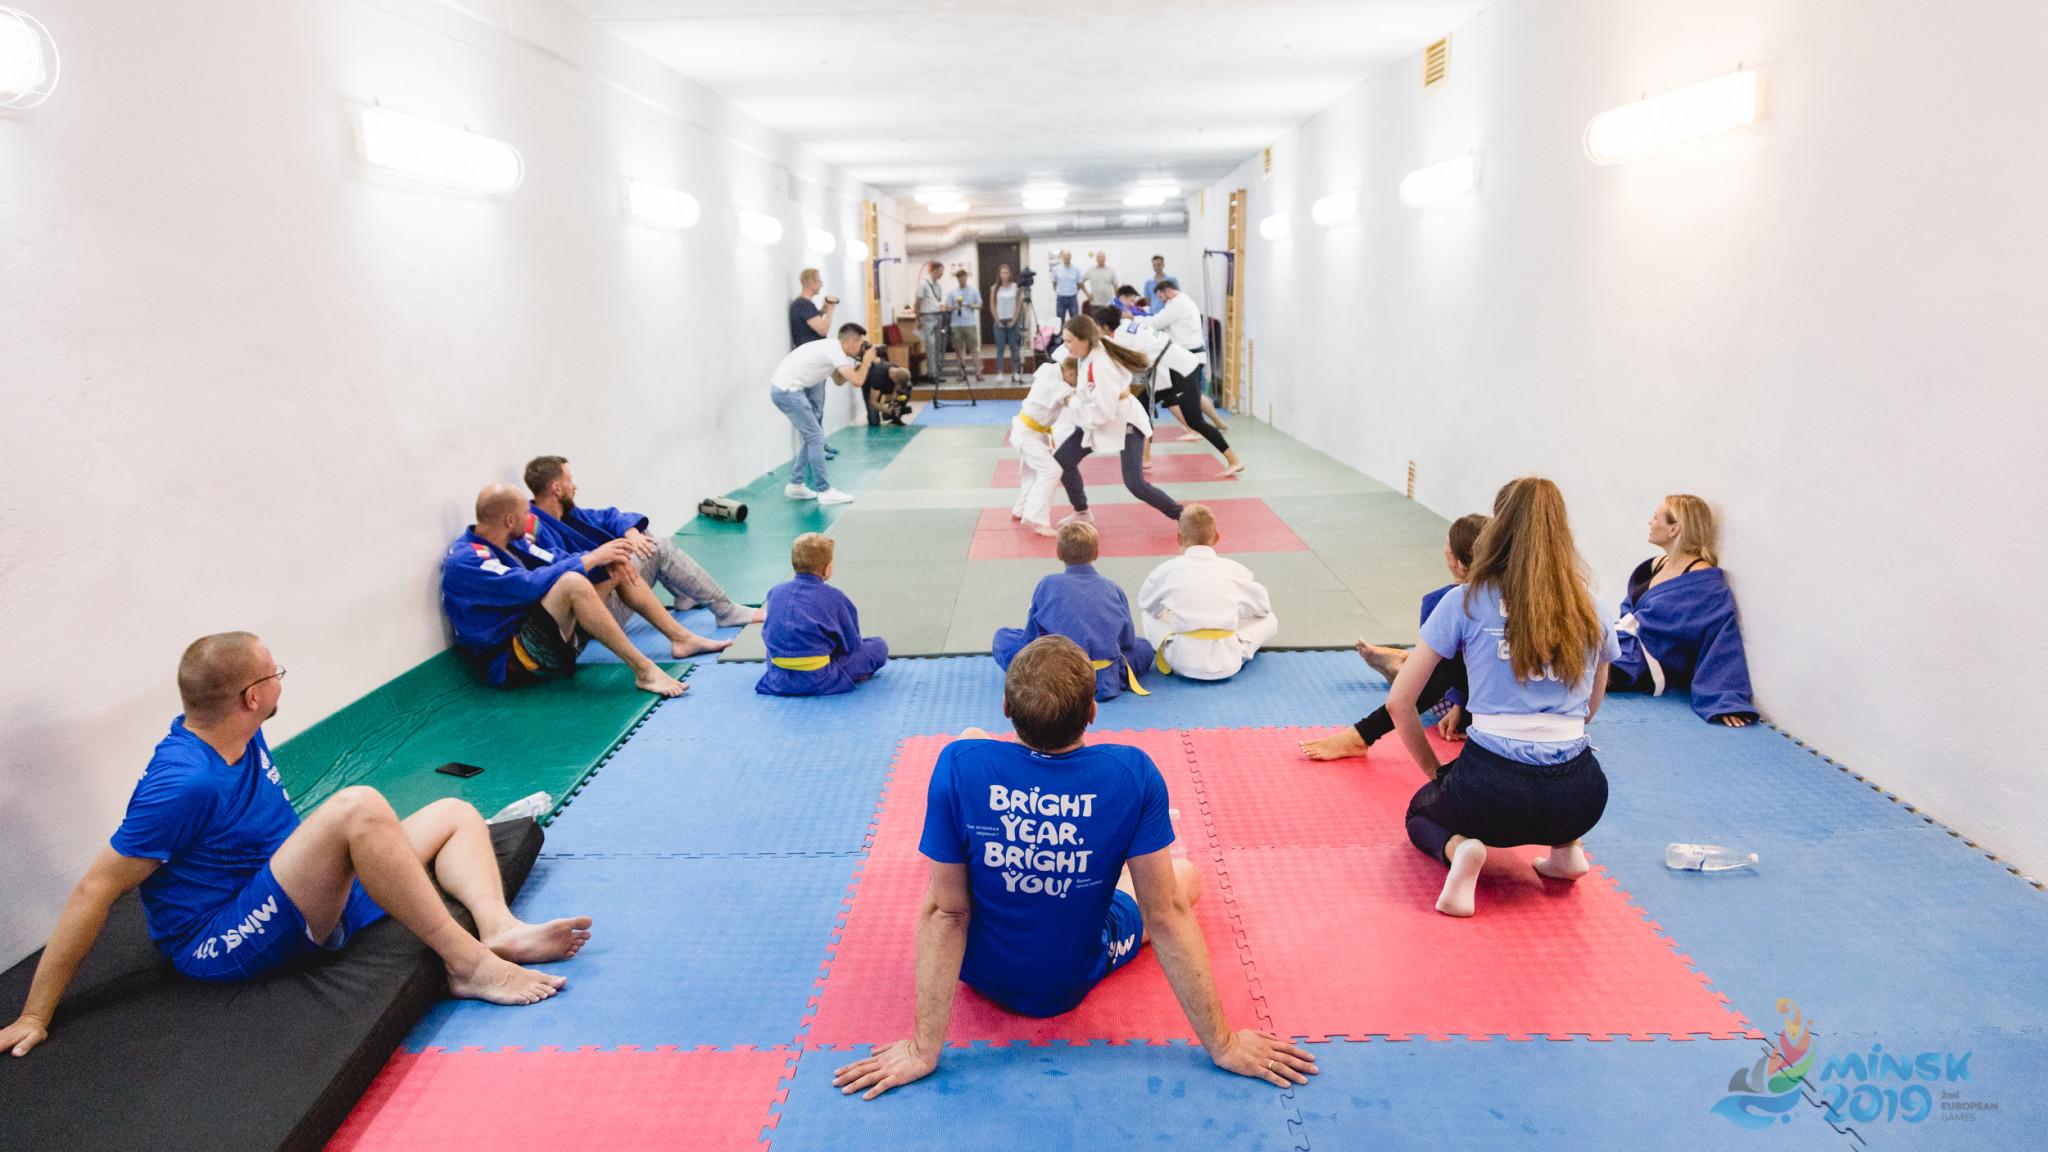 European judo champion Marina Slutskaya put the participants through their paces ©Minsk 2019